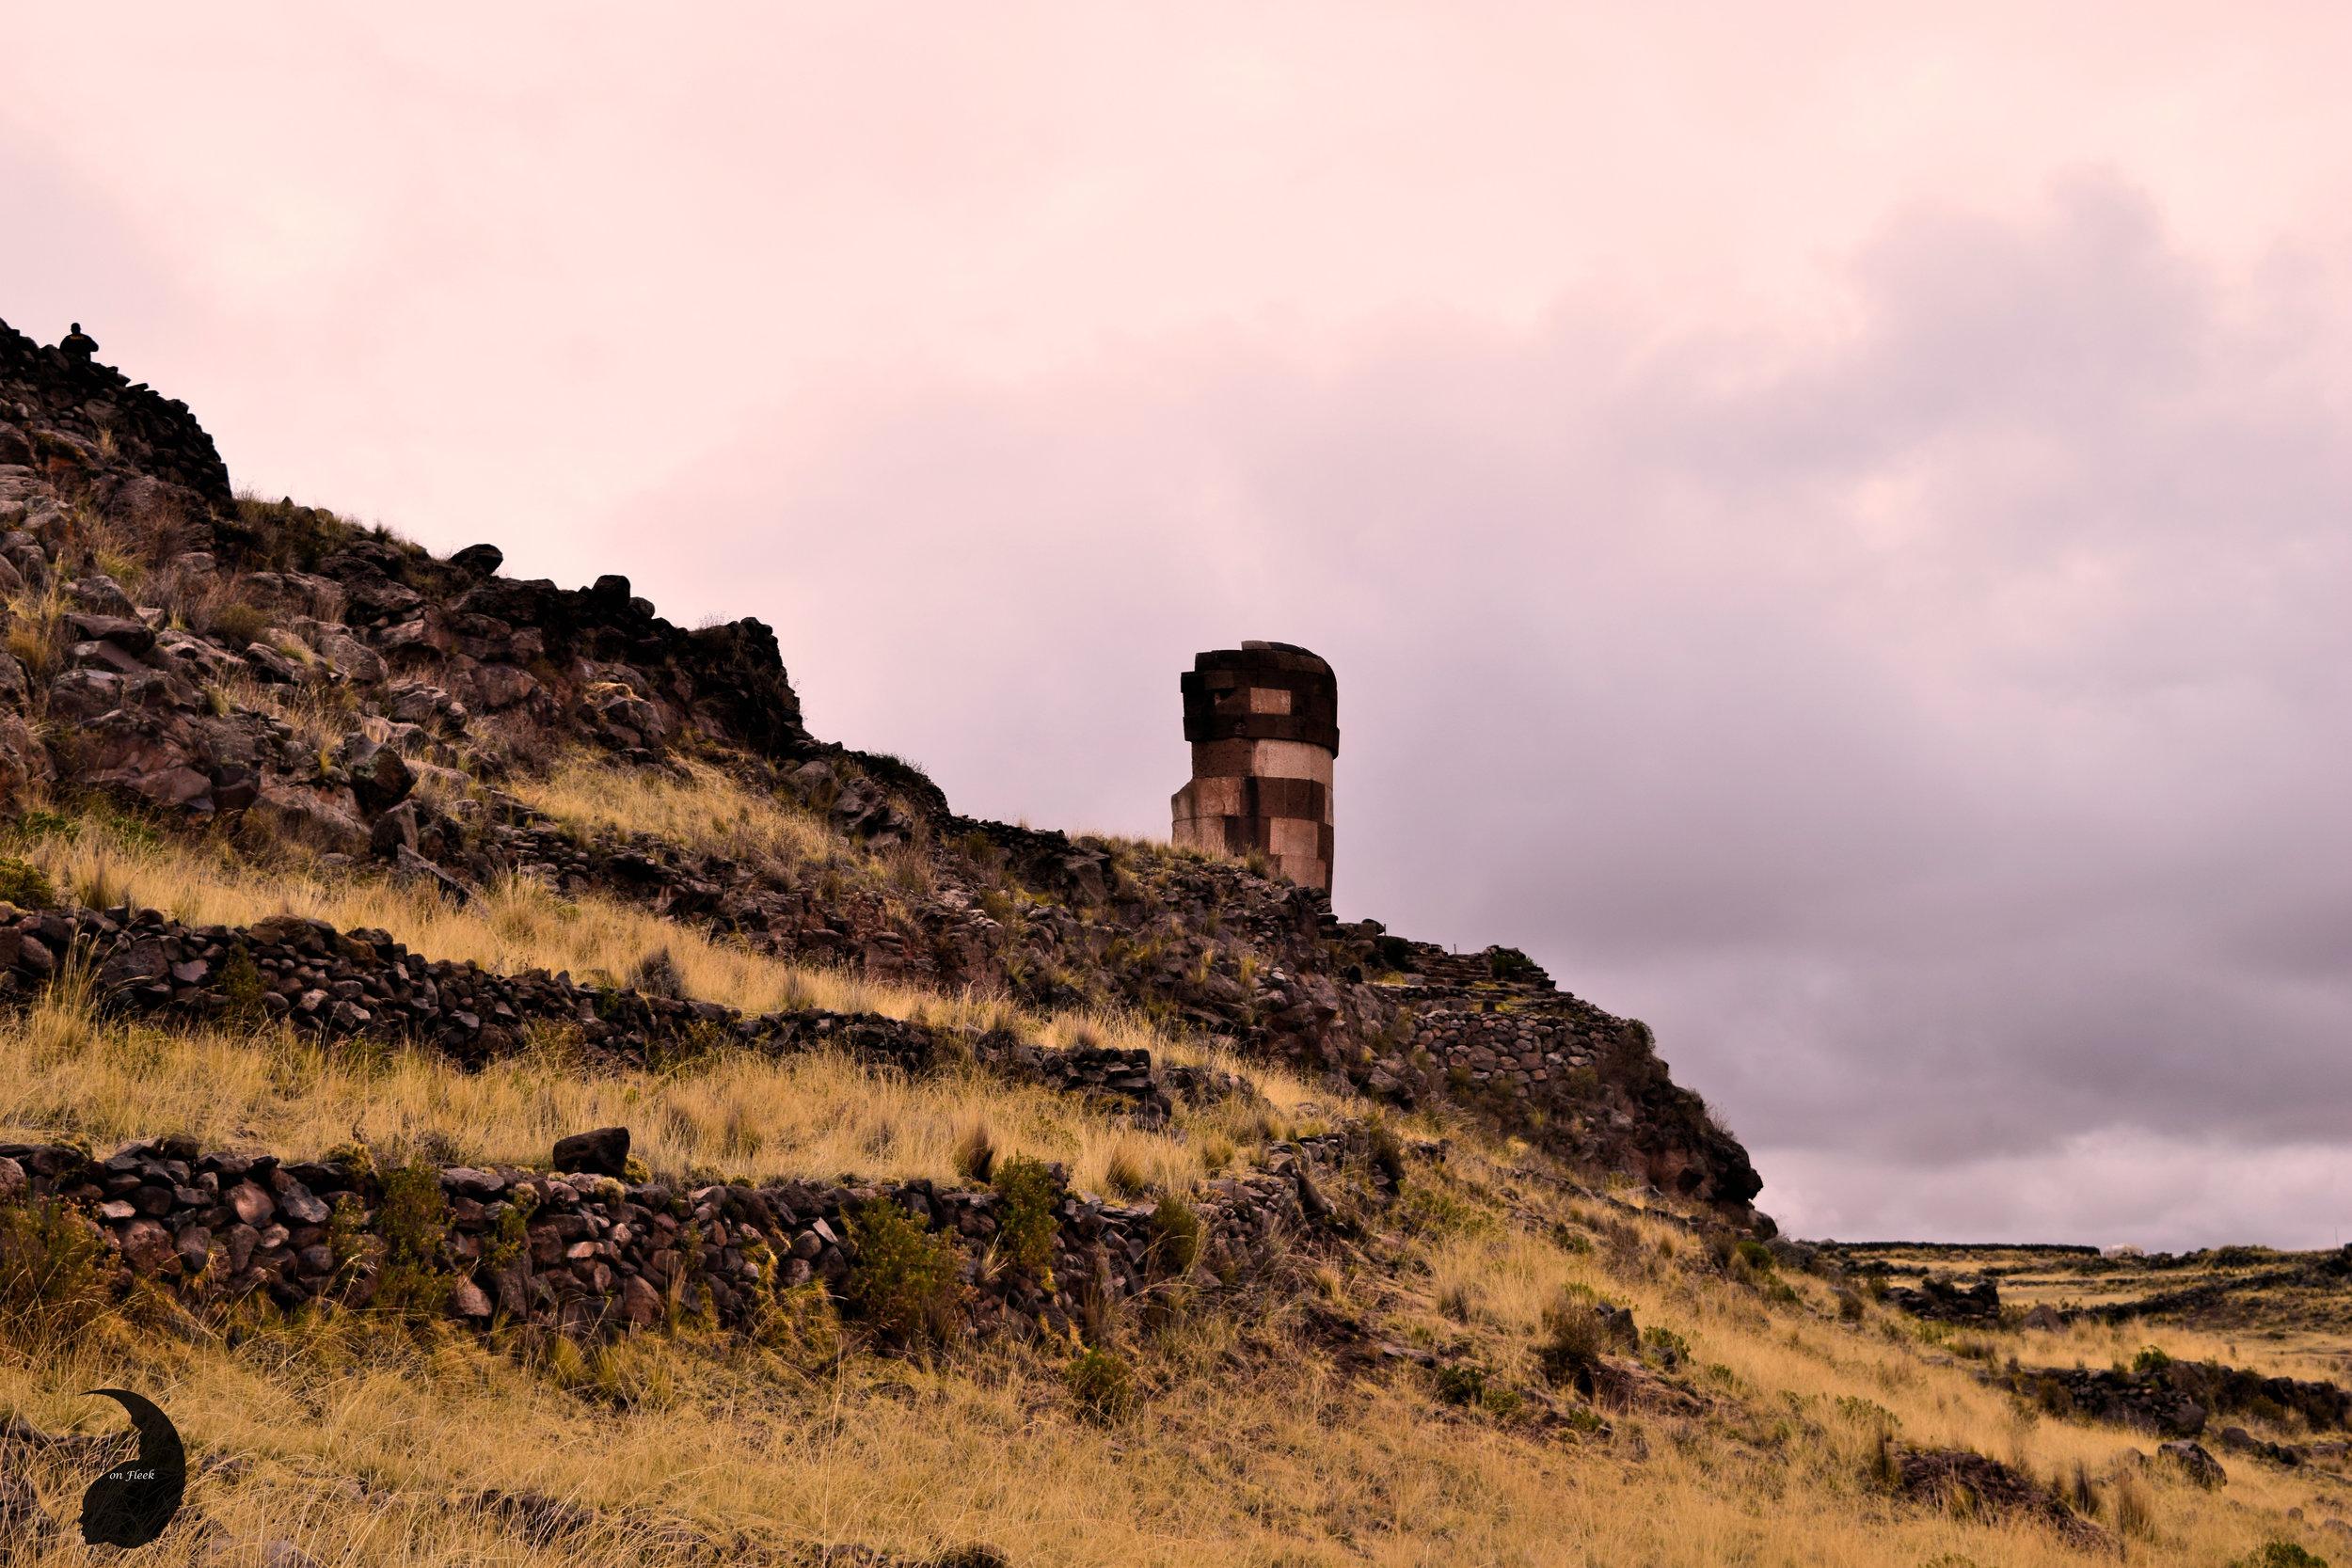 Dramatic Burial Towers- Sillustani, Peru